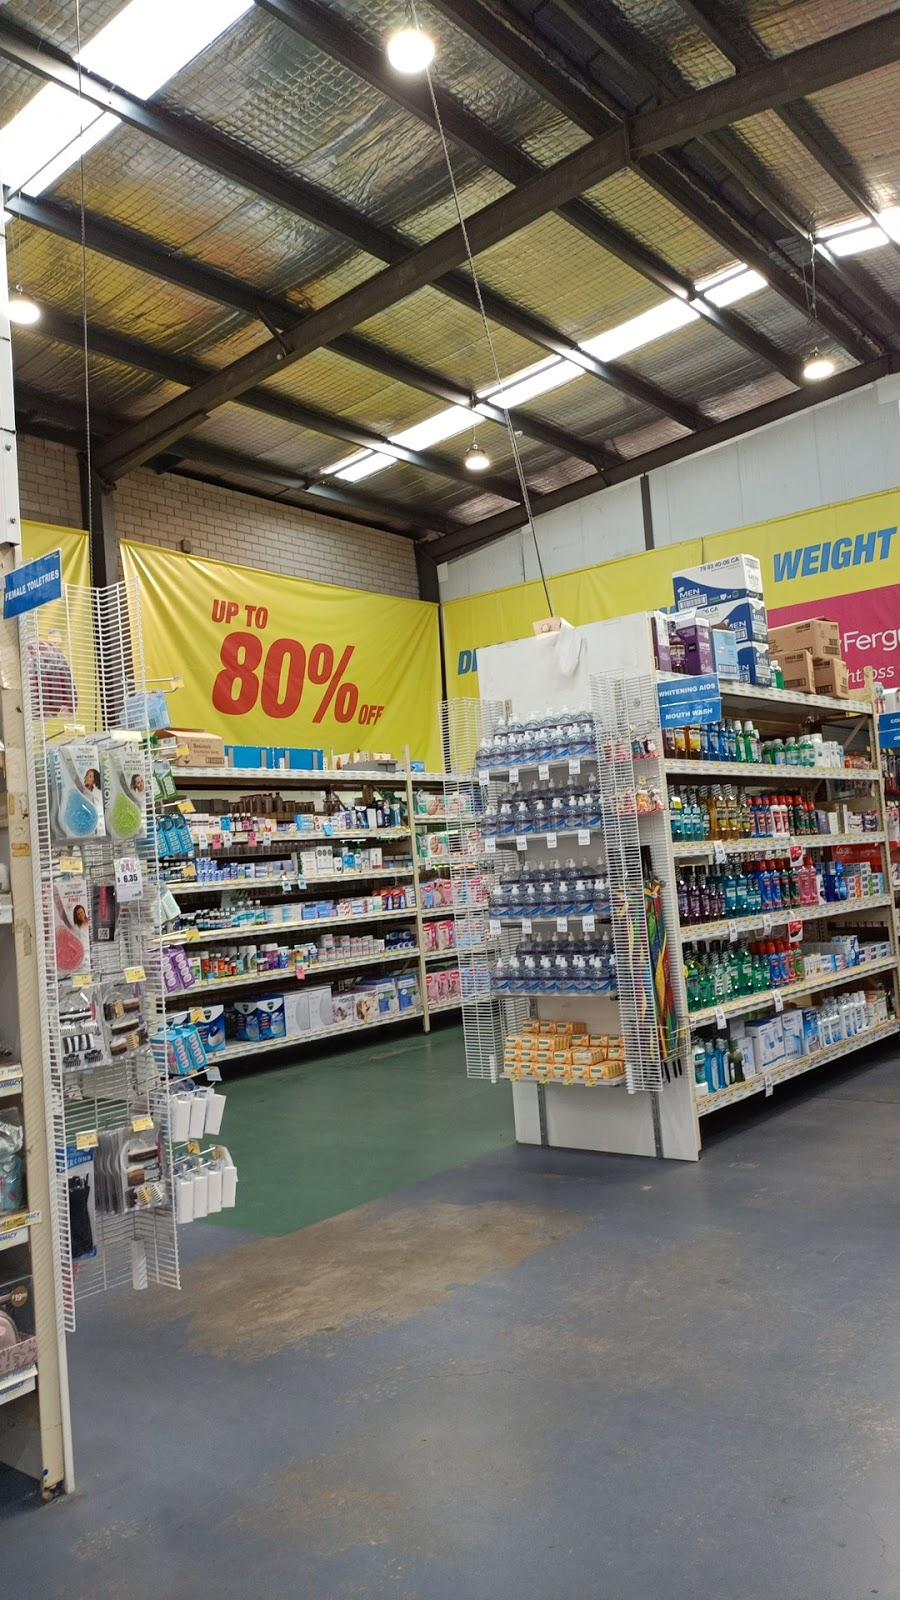 Pharmacy Direct Silverwater | pharmacy | 3 Coal St, Silverwater NSW 2128, Australia | 0297350100 OR +61 2 9735 0100